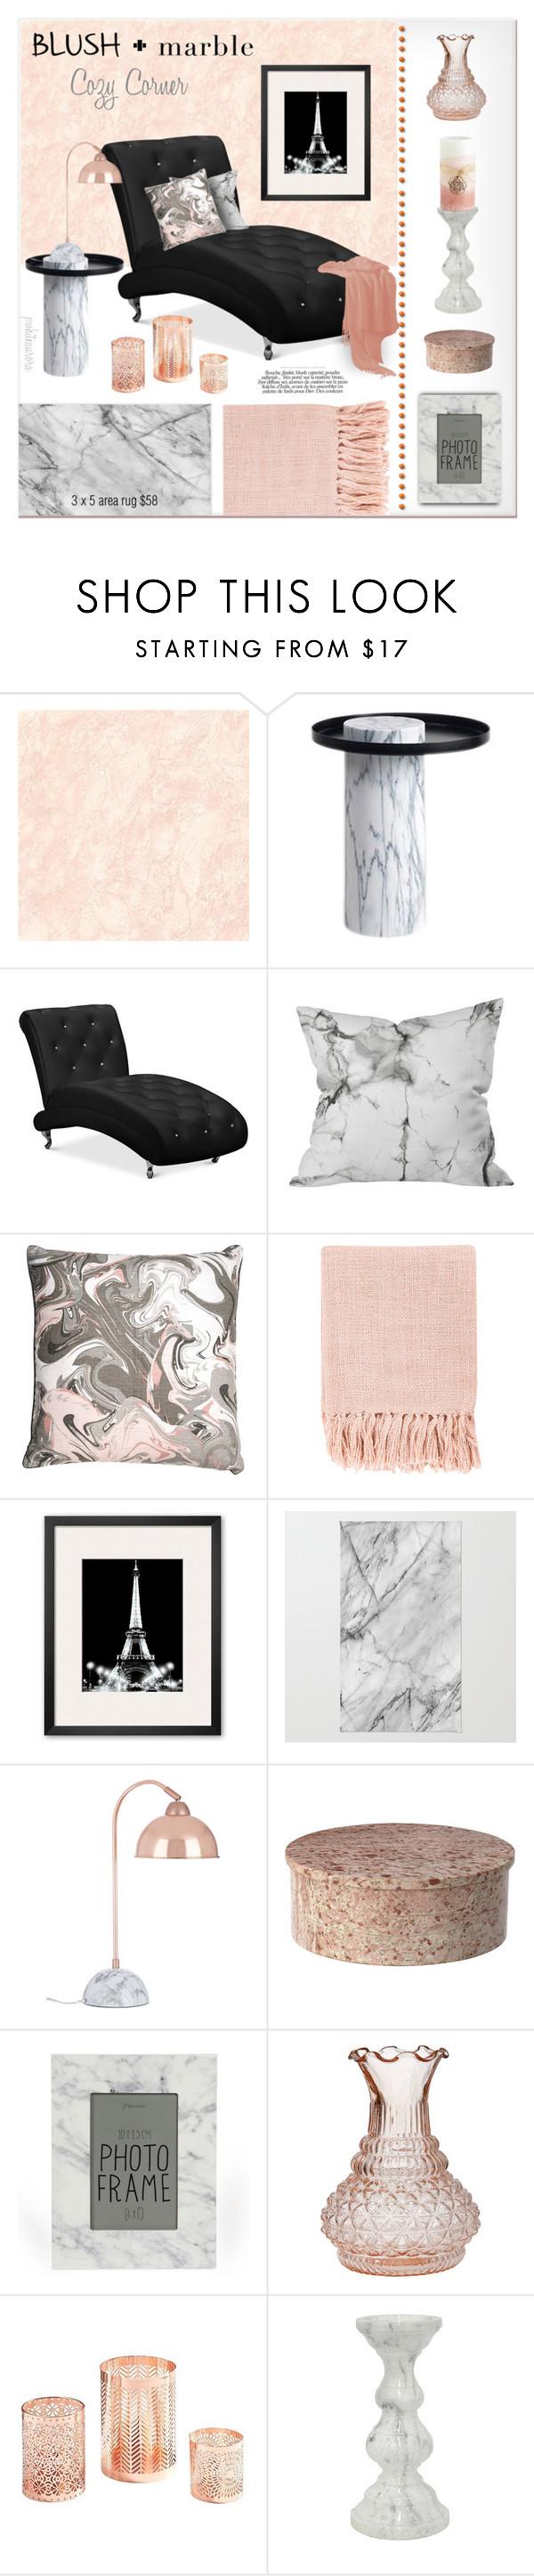 """Blush & Marble Cozy Corner"" by pwhiteaurora ❤ liked on Polyvore featuring interior, interiors, interior design, home, home decor, interior decorating, LA CHANCE, Ryan Studio, Surya and Broste Copenhagen"